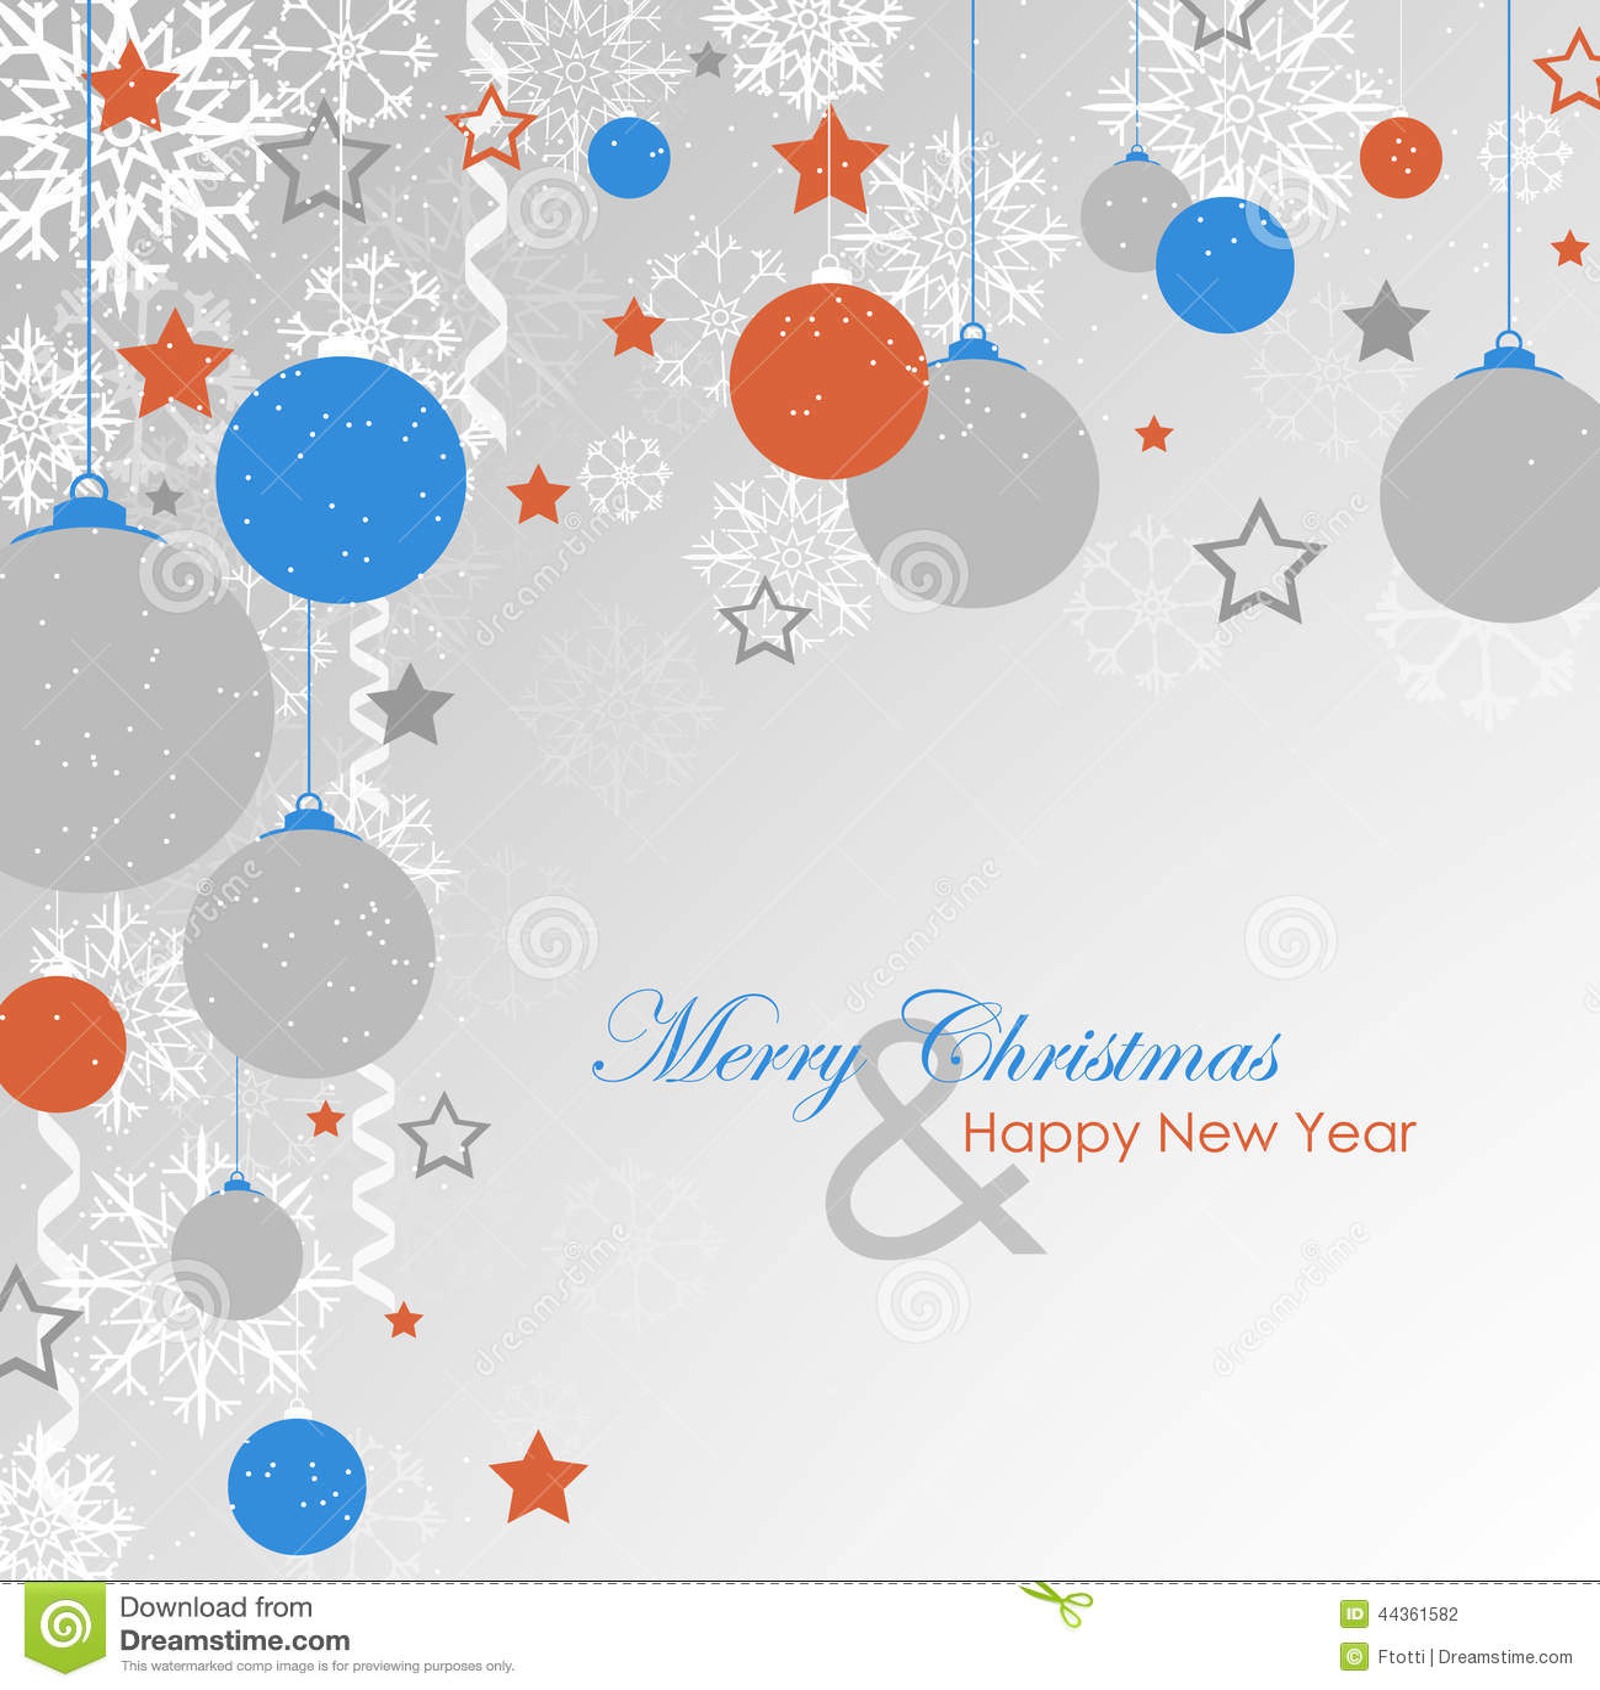 Orange And Blue Christmas Lights